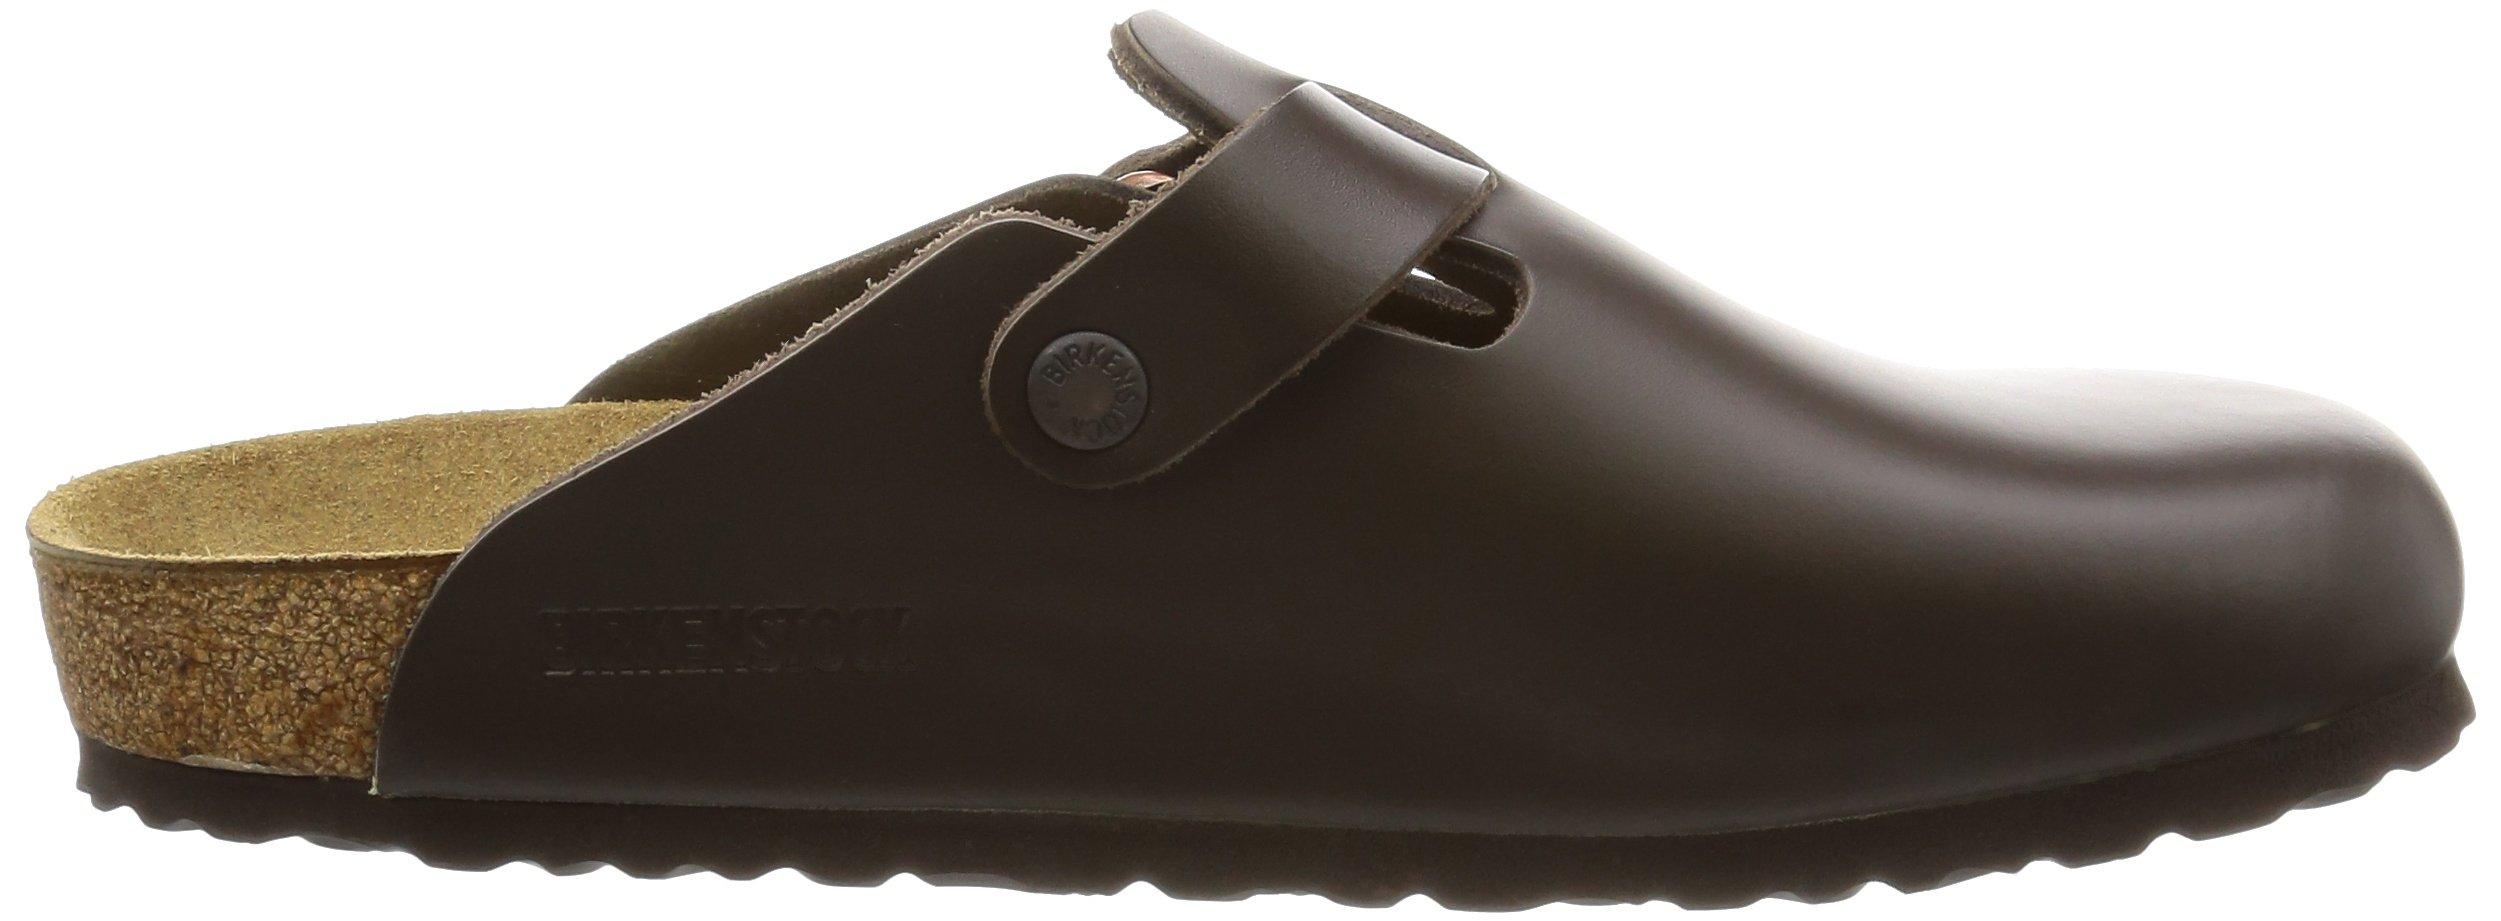 Birkenstock Boston, Unisex Adults' Clogs, Dark Brown Leather,8 UK by Birkenstock (Image #7)